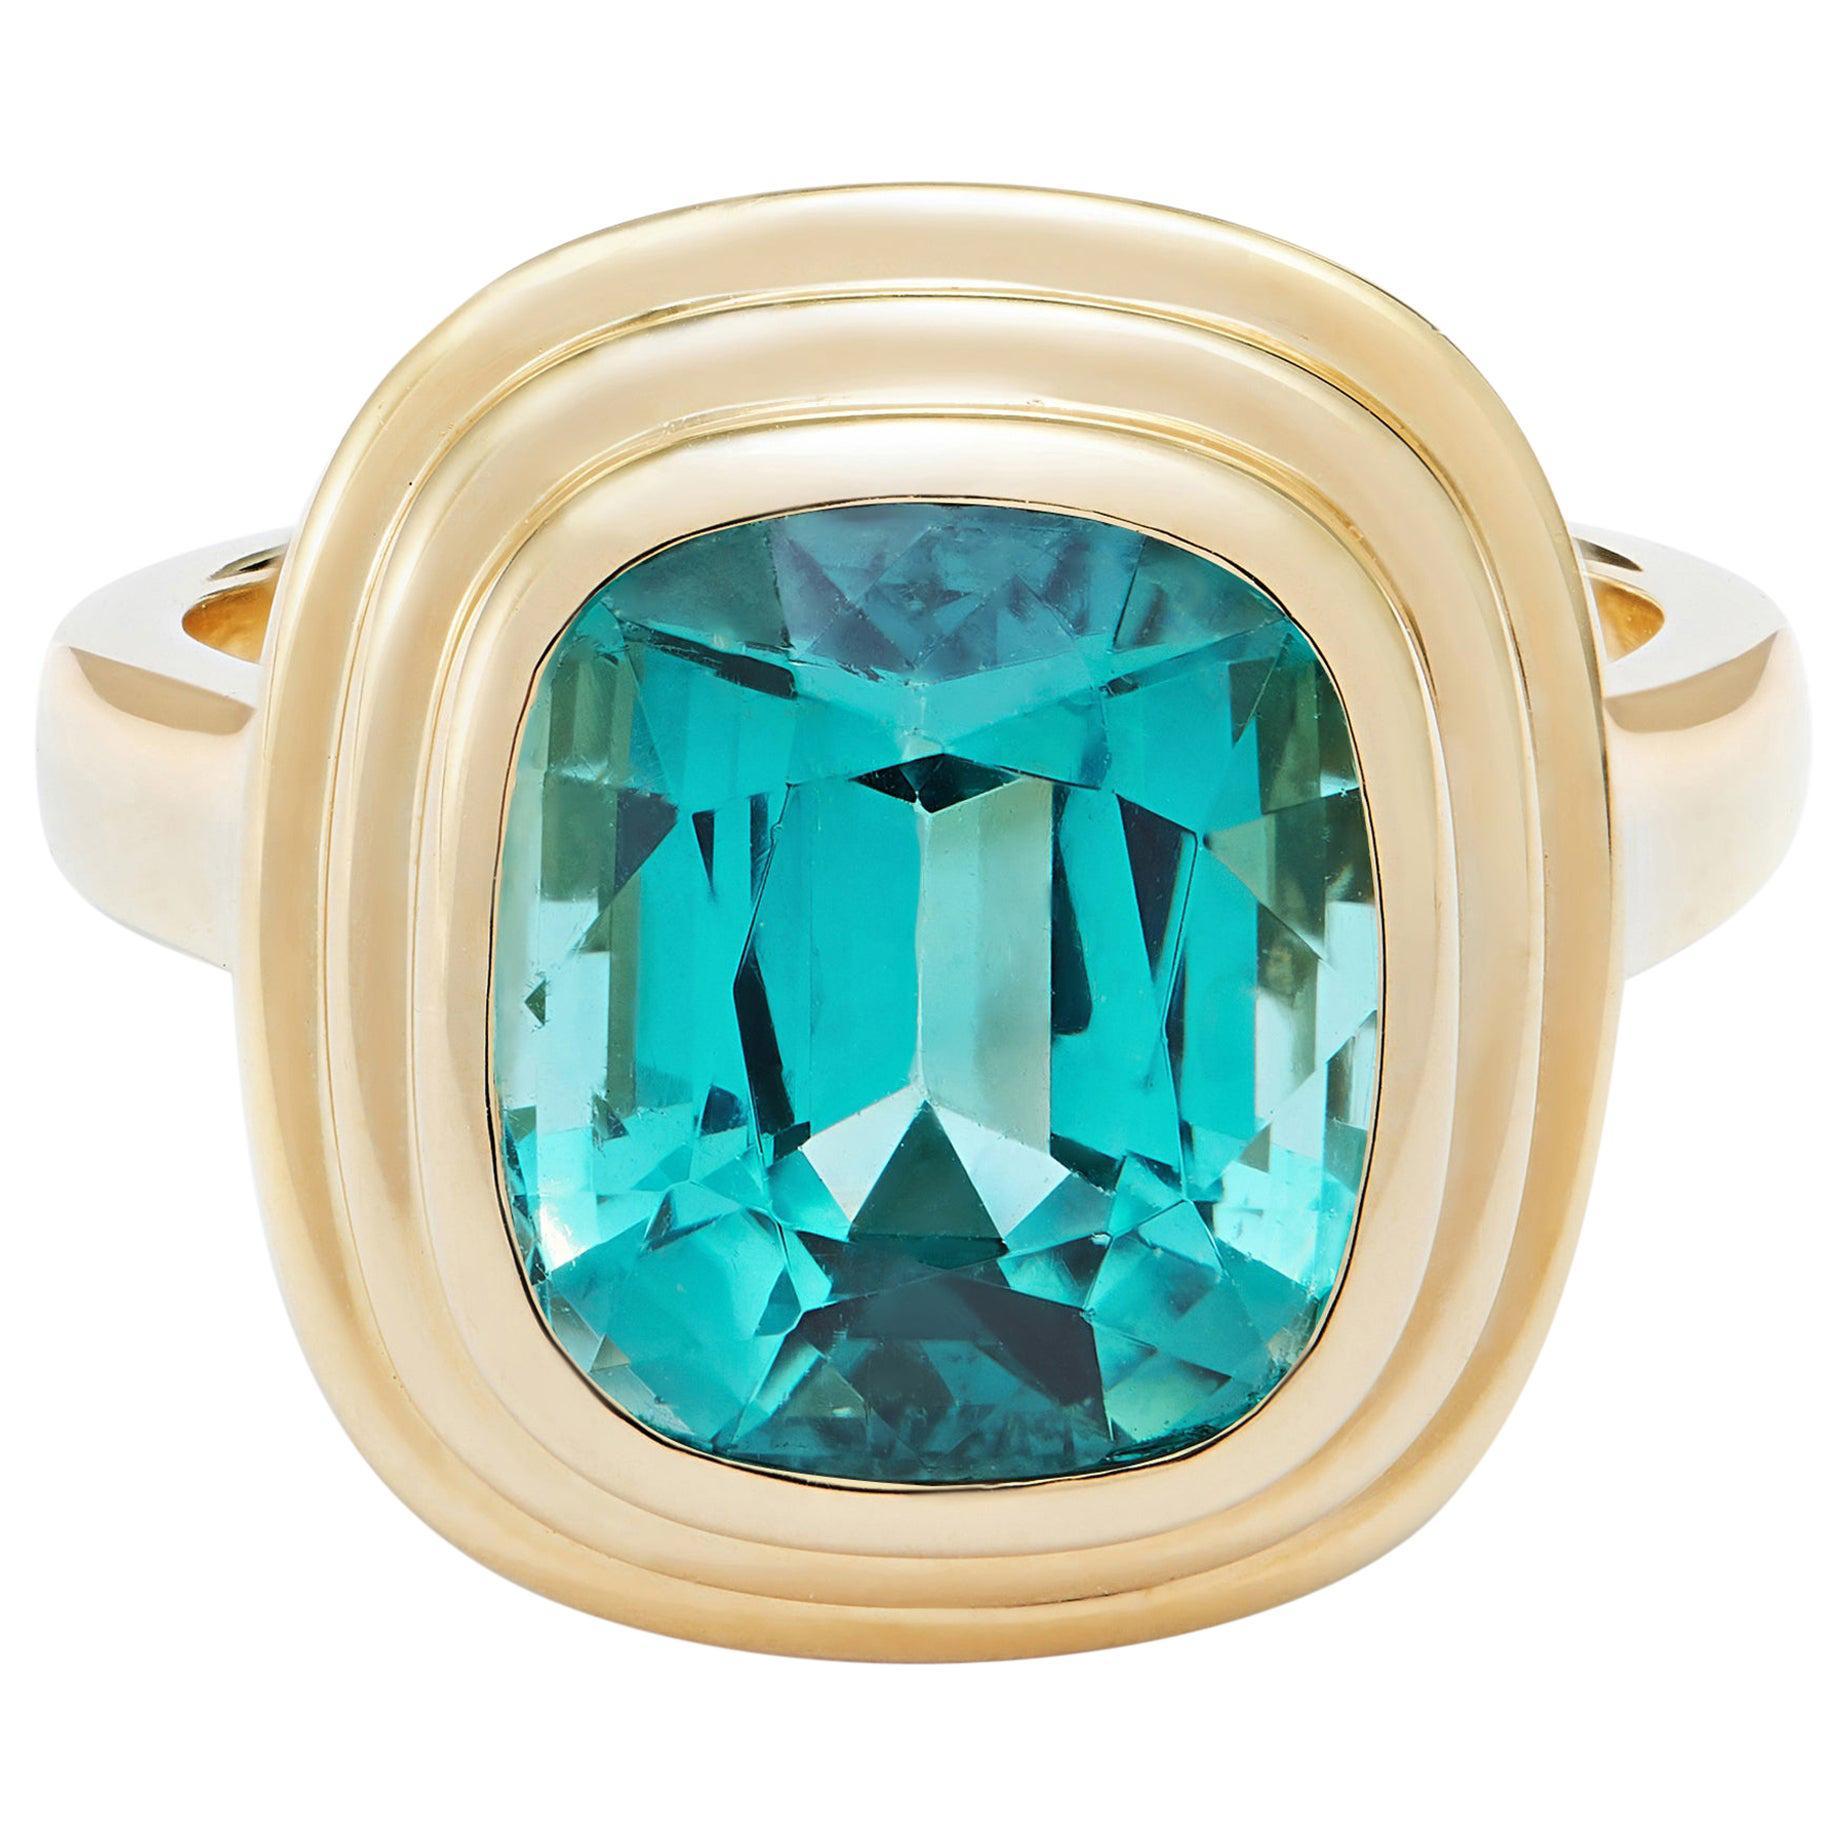 Minka, 6.34 Carat Cushion Cut Blue Tourmaline 18 Karat Yellow Gold Athena Ring